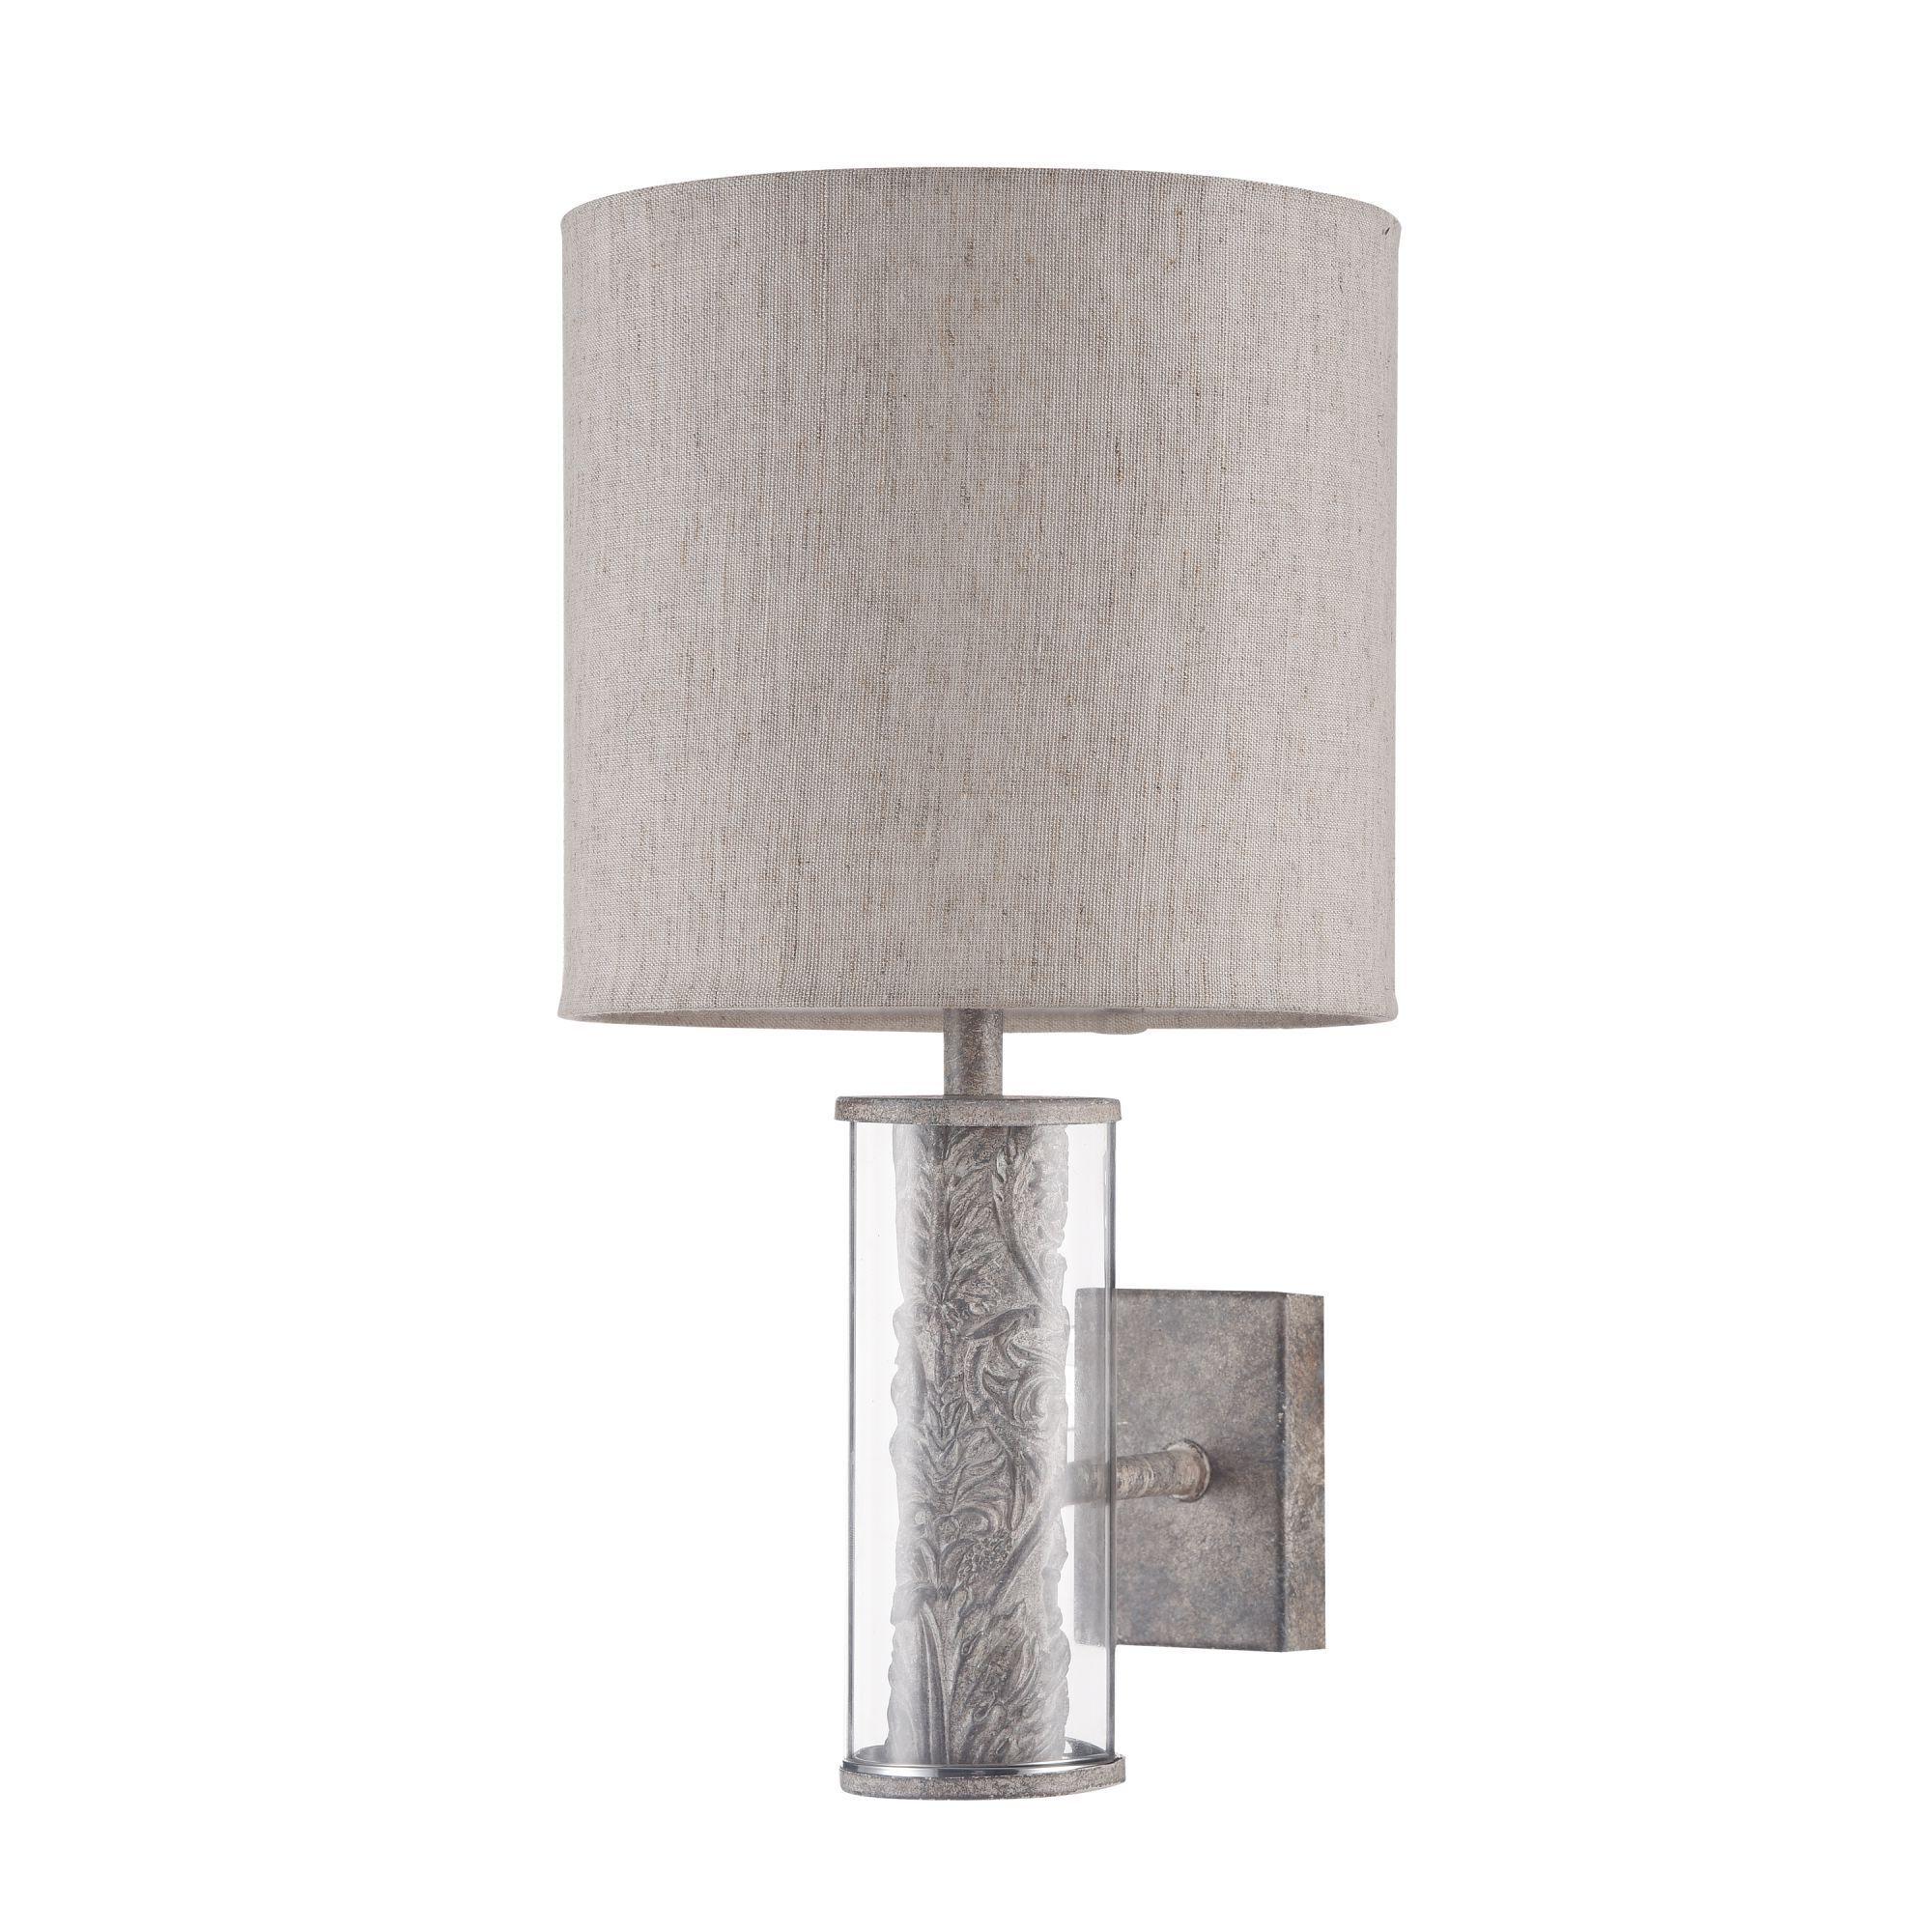 Бра Maytoni Maryland ARM526WL-01GR, 1xE14x40W, серый с прозрачным, серый, стекло с металлом, текстиль - фото 3